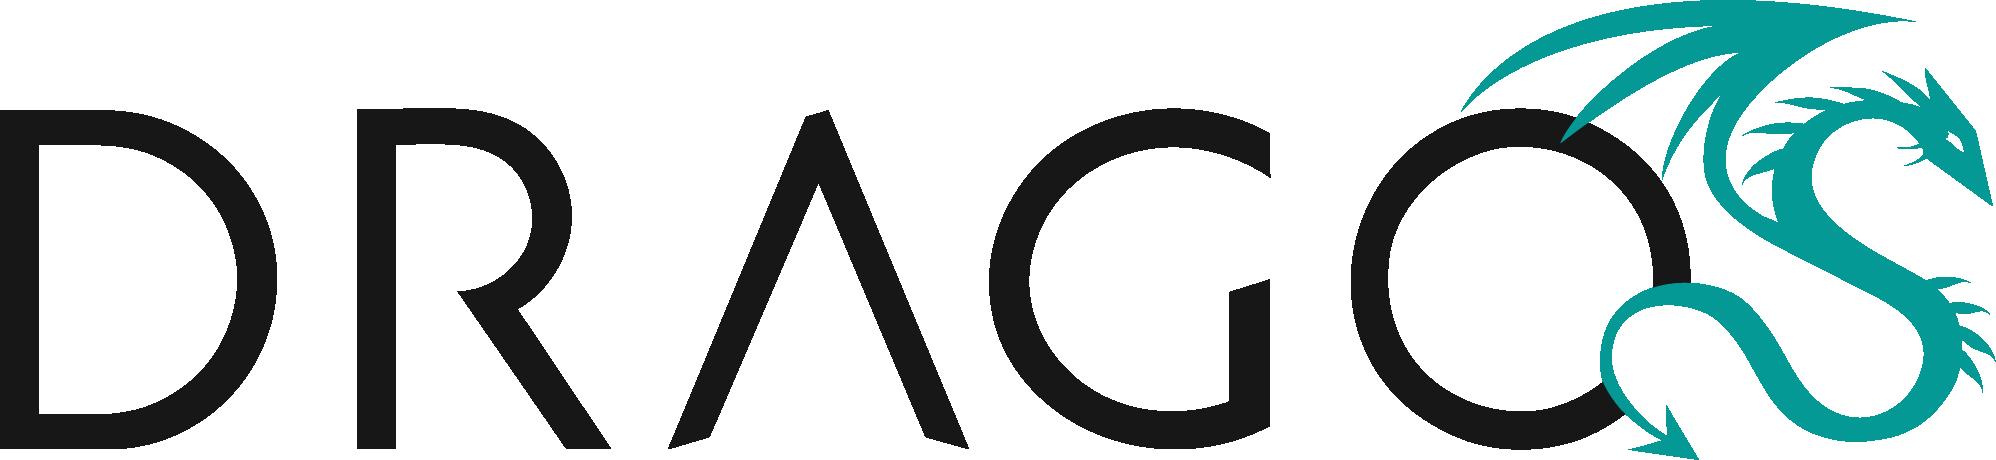 PRIMARY_LOGO_Dragos_Logo_RGB_Transparent.png